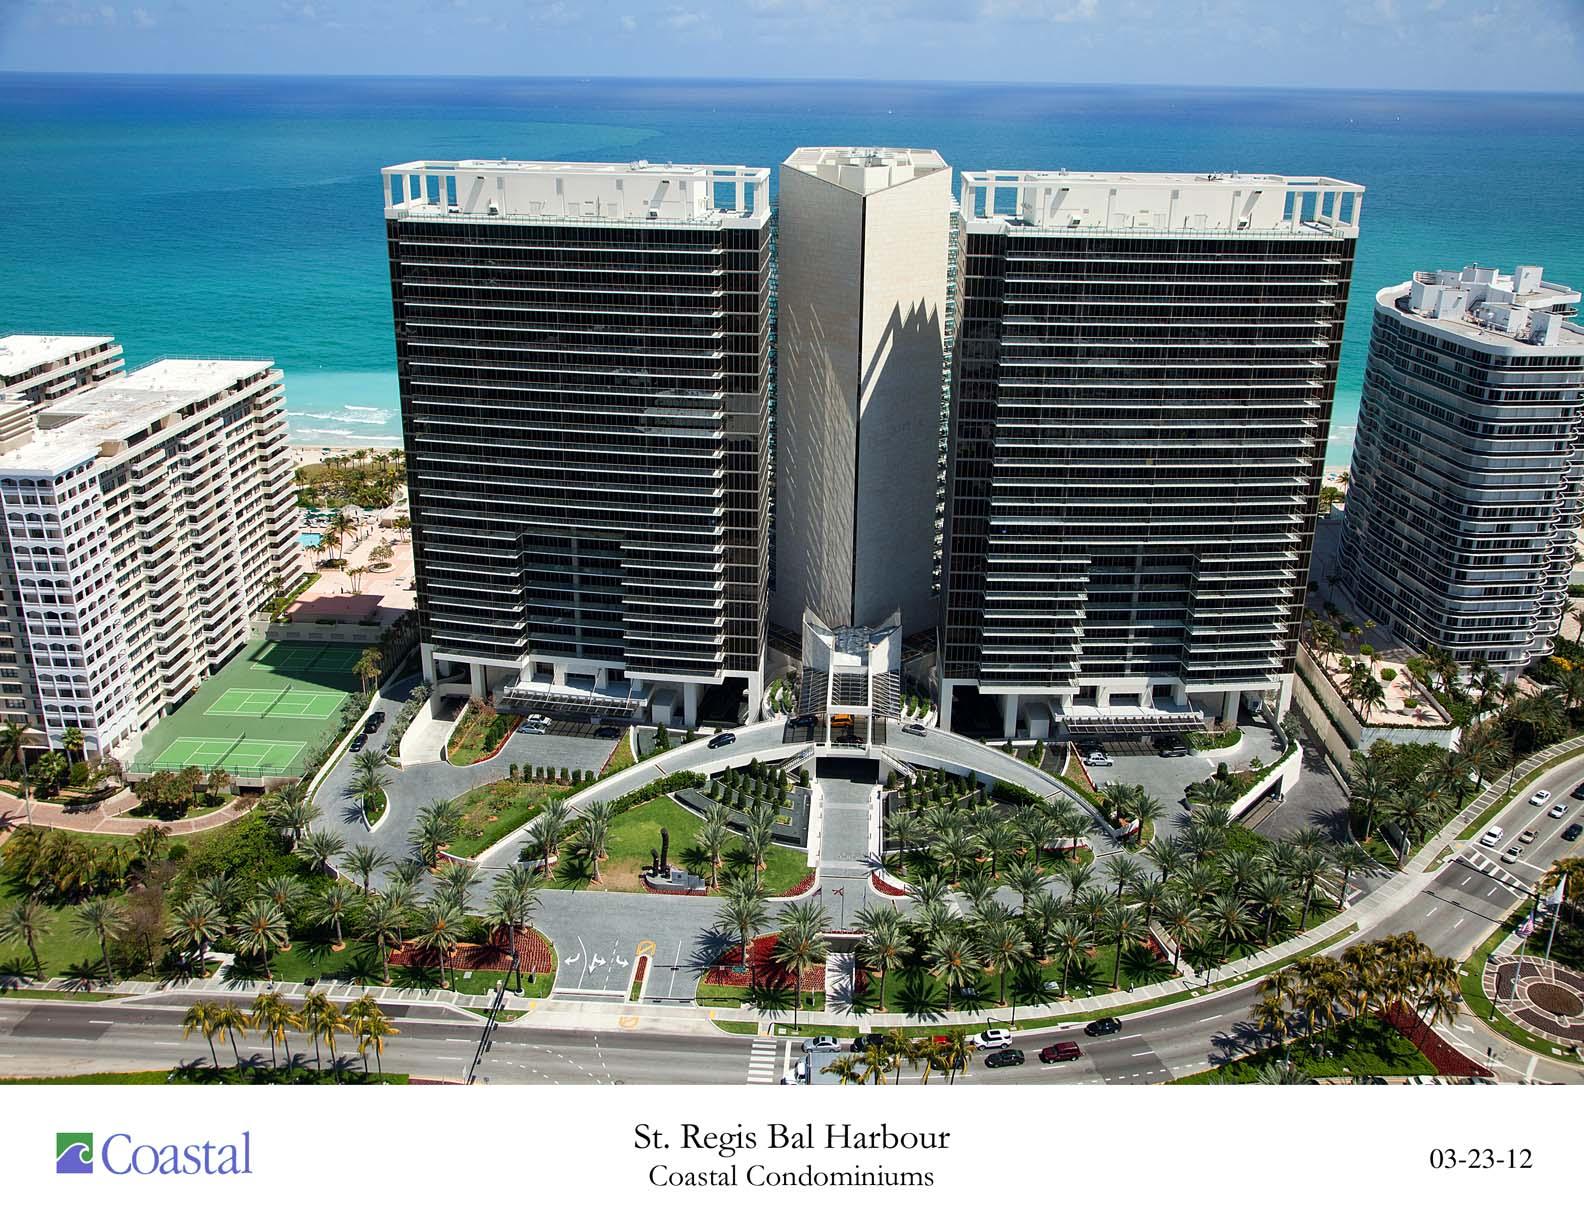 St. Regis Bal Harbour, Miami Beach, FL